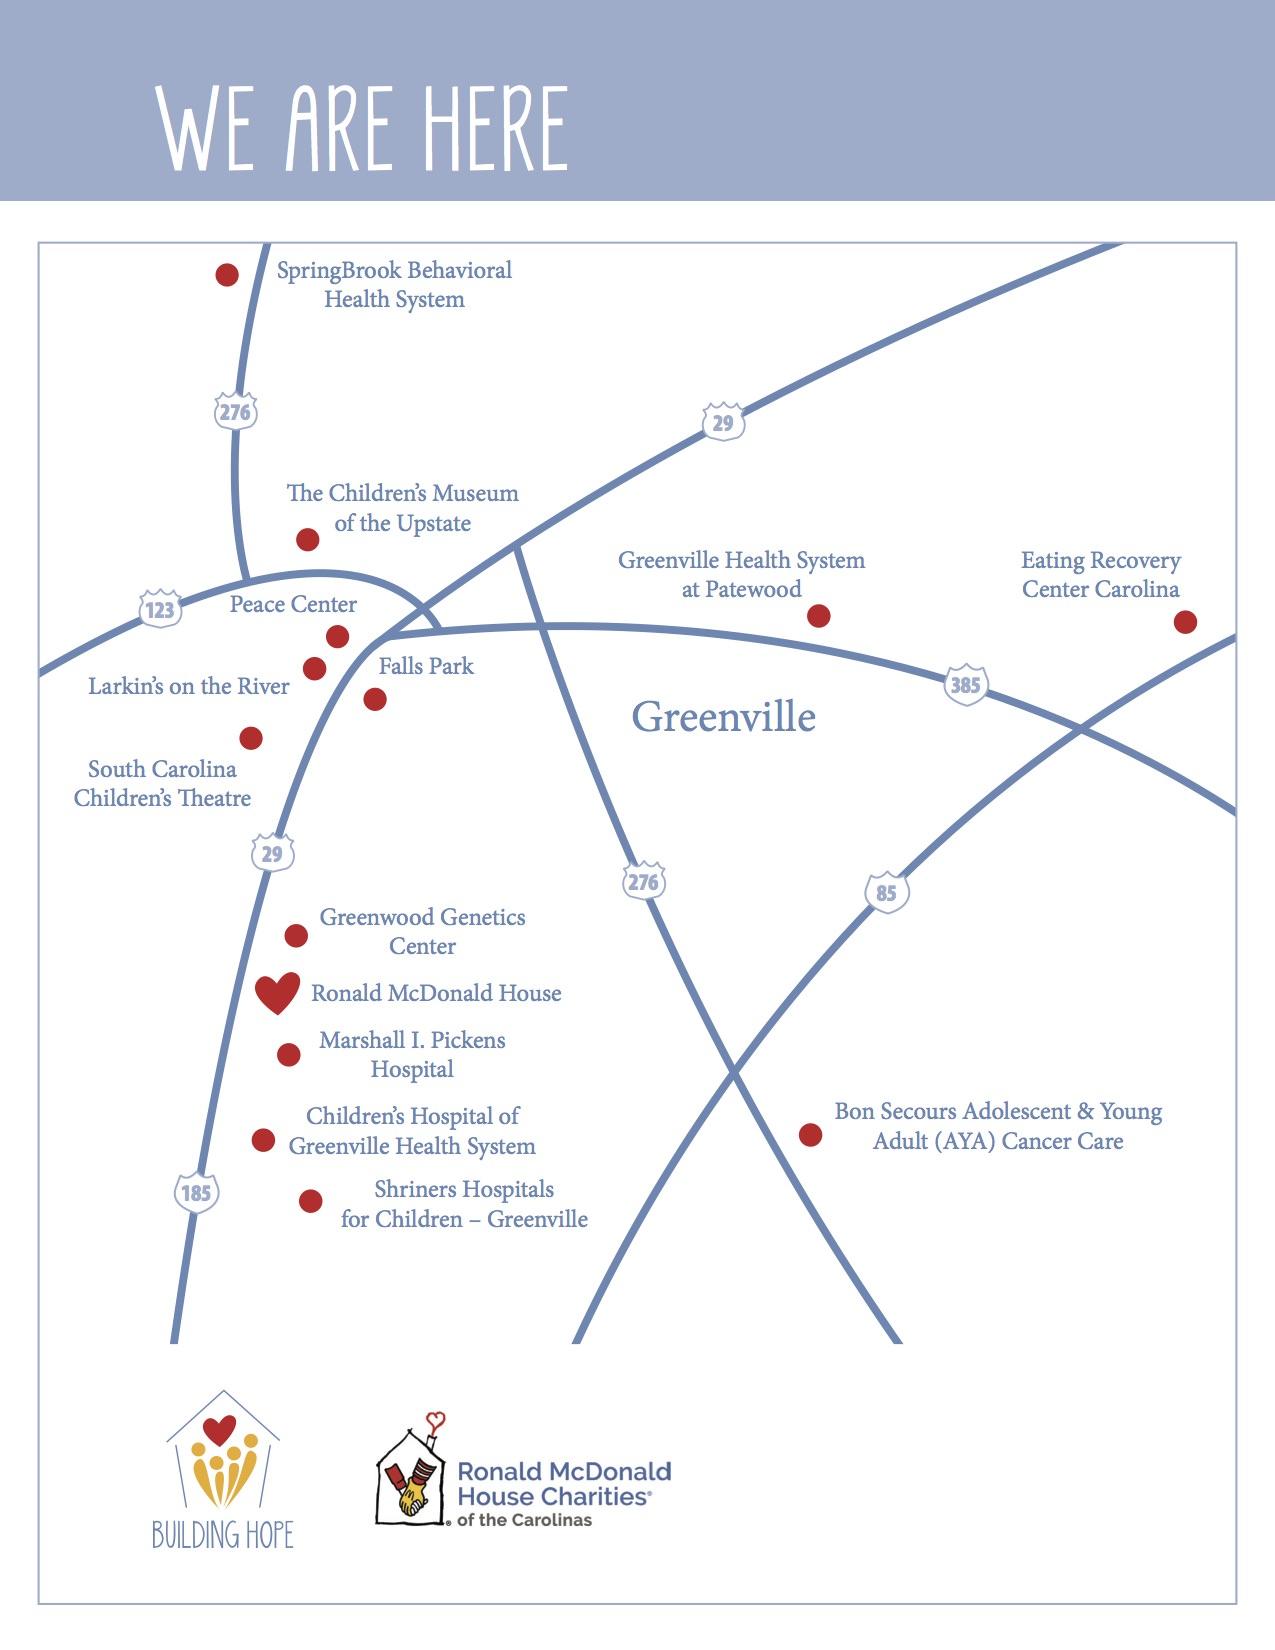 RMH-1010-Capital Campaign Impact MapRMH-1010-Capital Campaign Impact Map...[1]